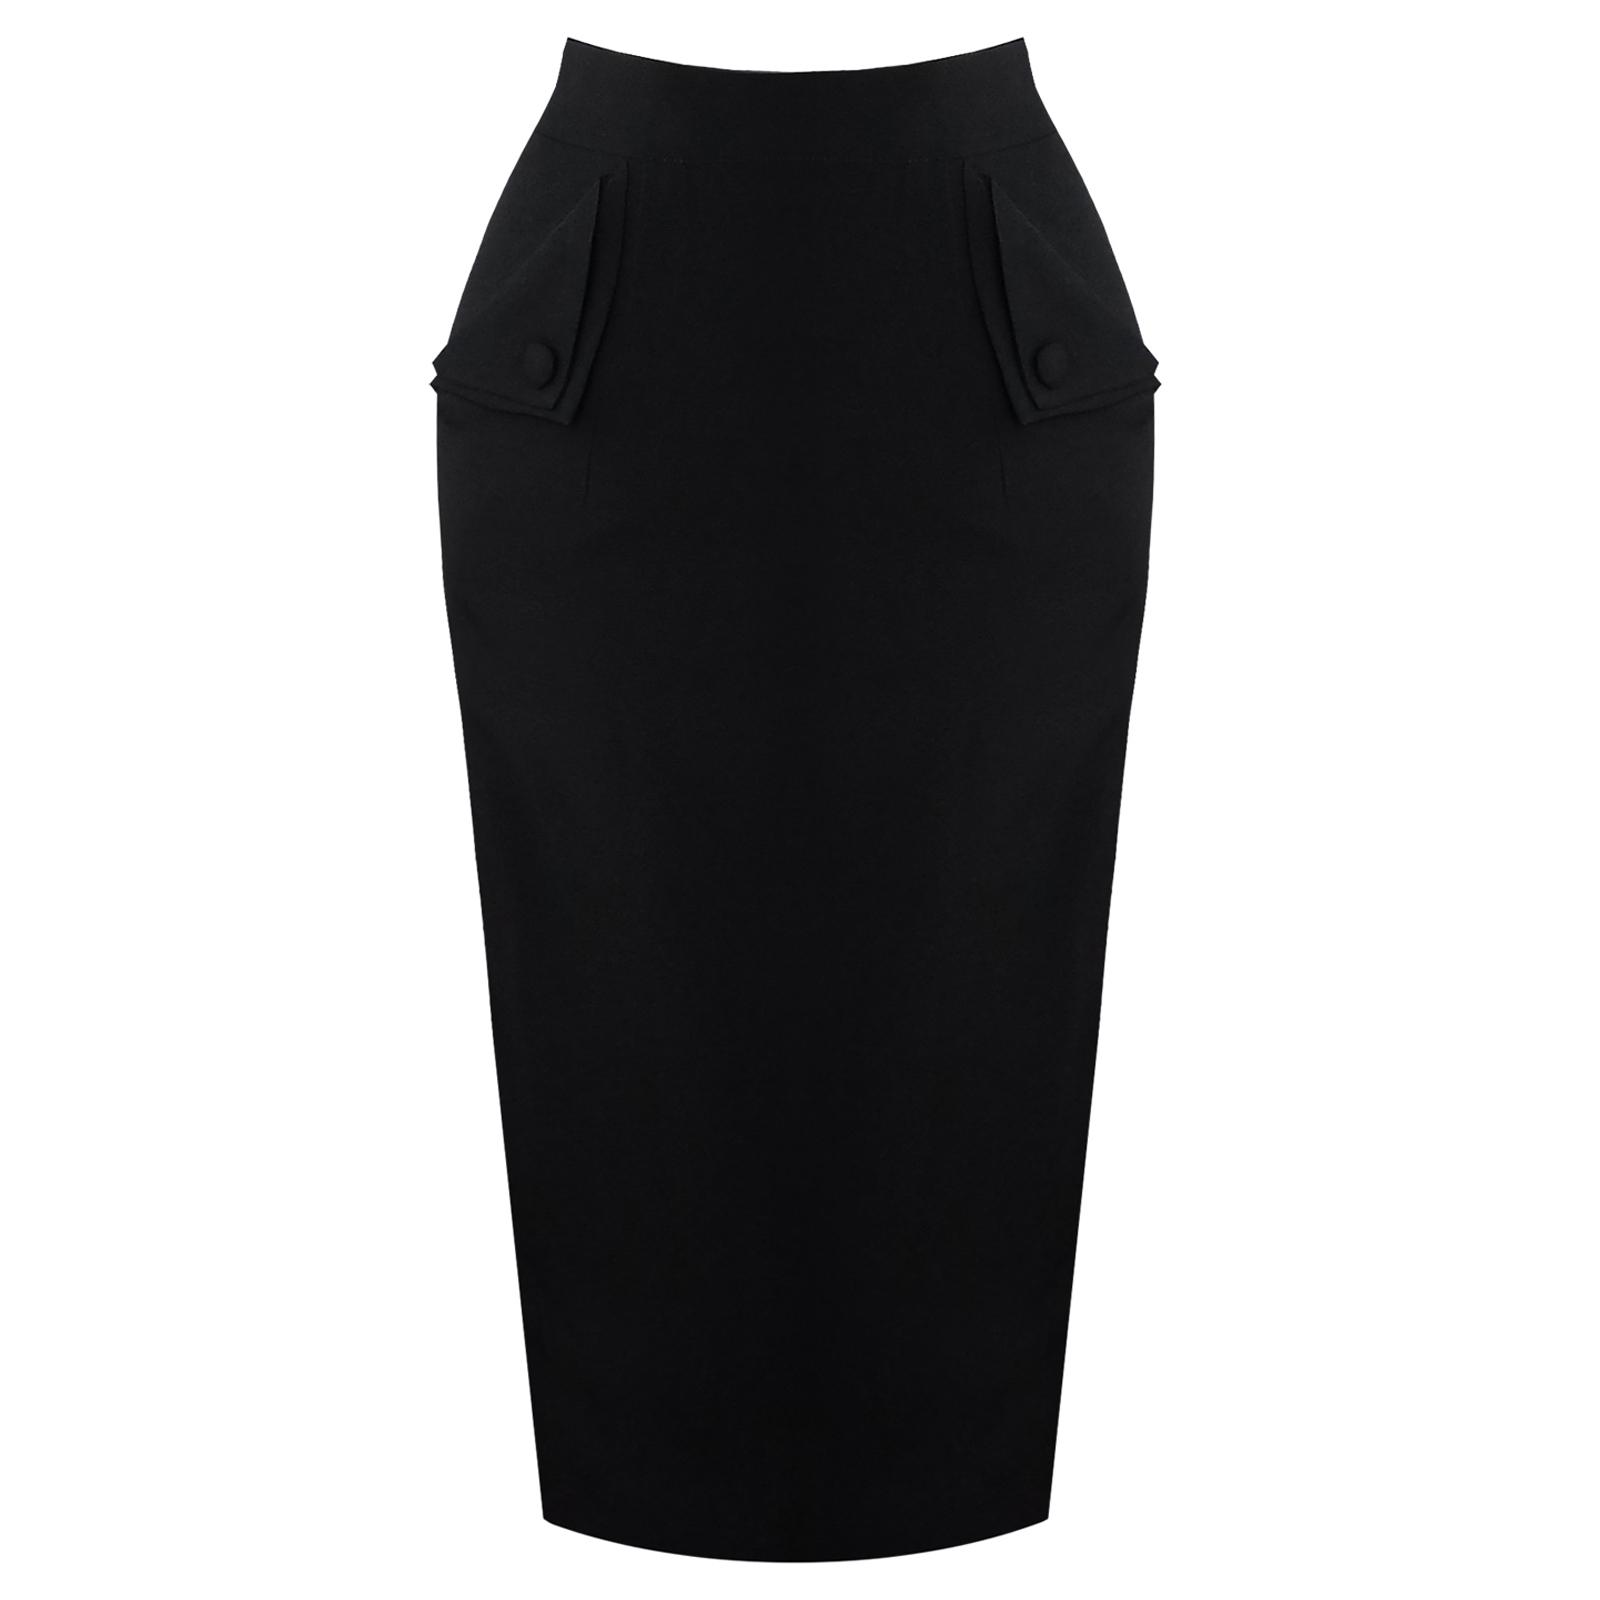 banned black pencil skirt 1950s fashion starlet vintage